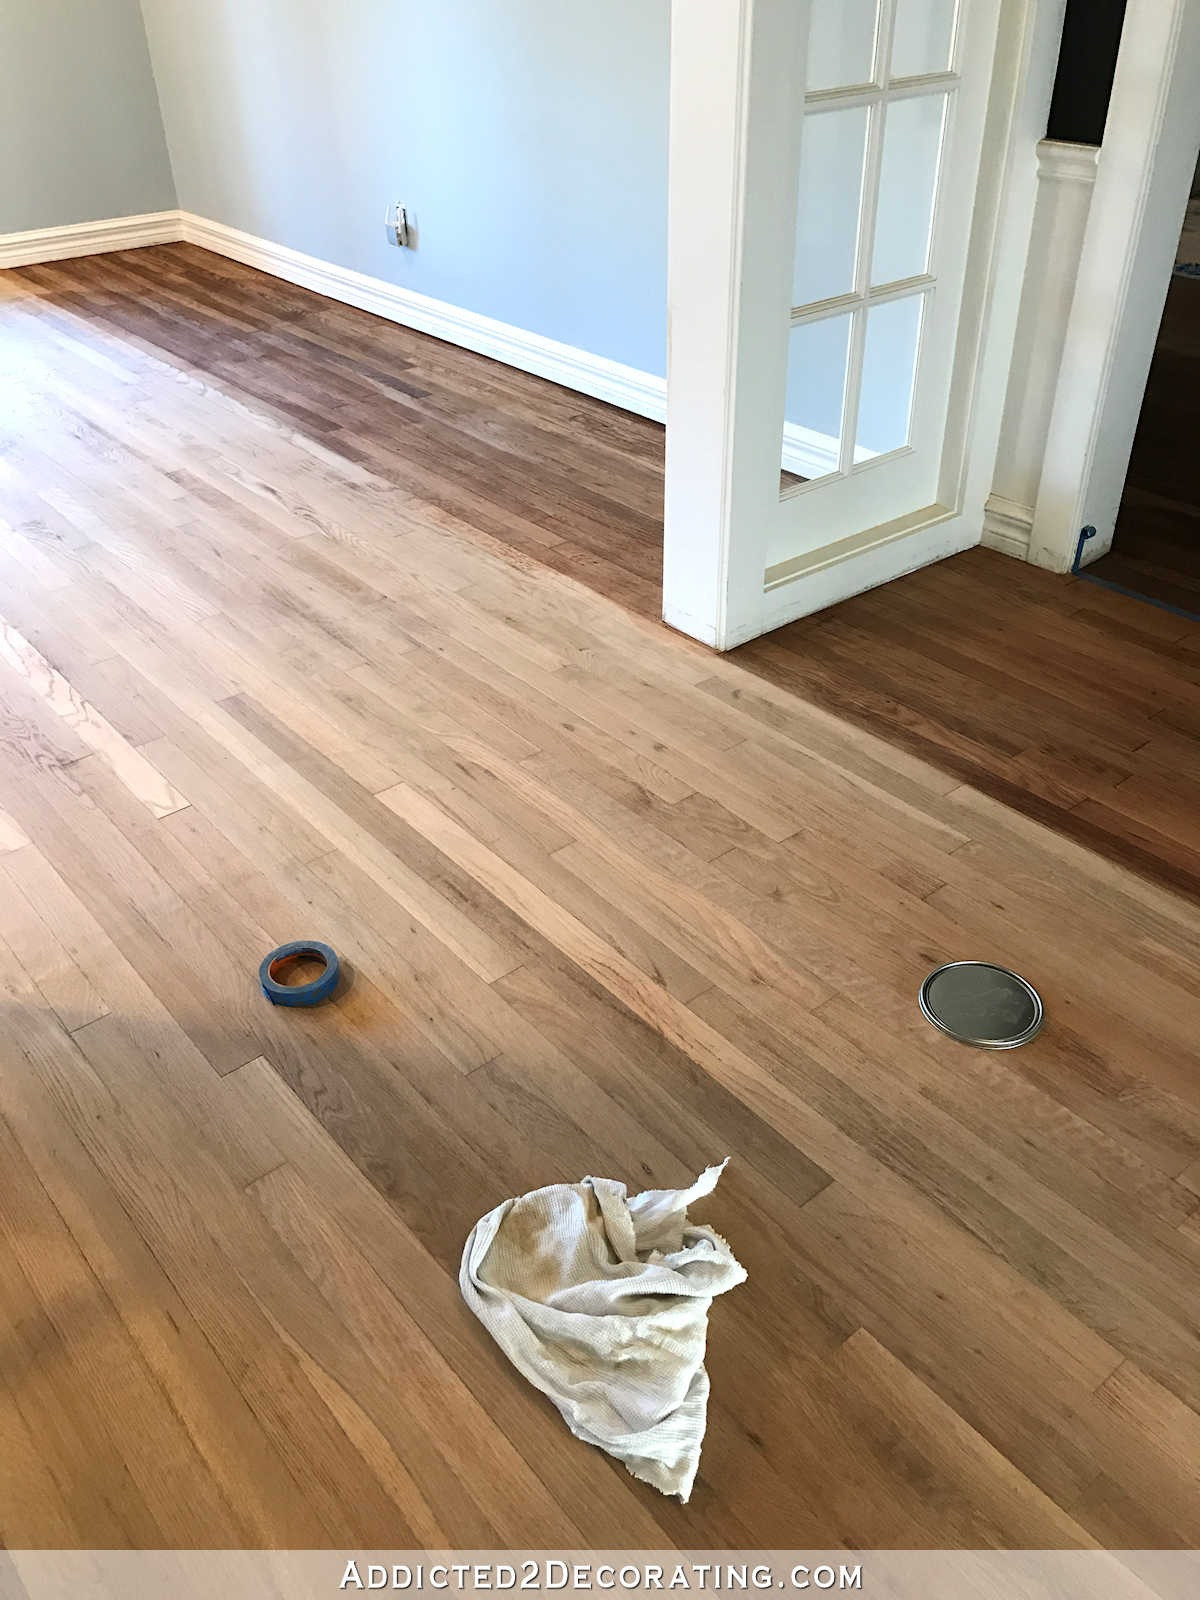 3 1 4 red oak hardwood flooring of red oak butcher block countertops lovely 60 elegant wood look pertaining to red oak butcher block countertops beautiful adventures in staining my red oak hardwood floors products